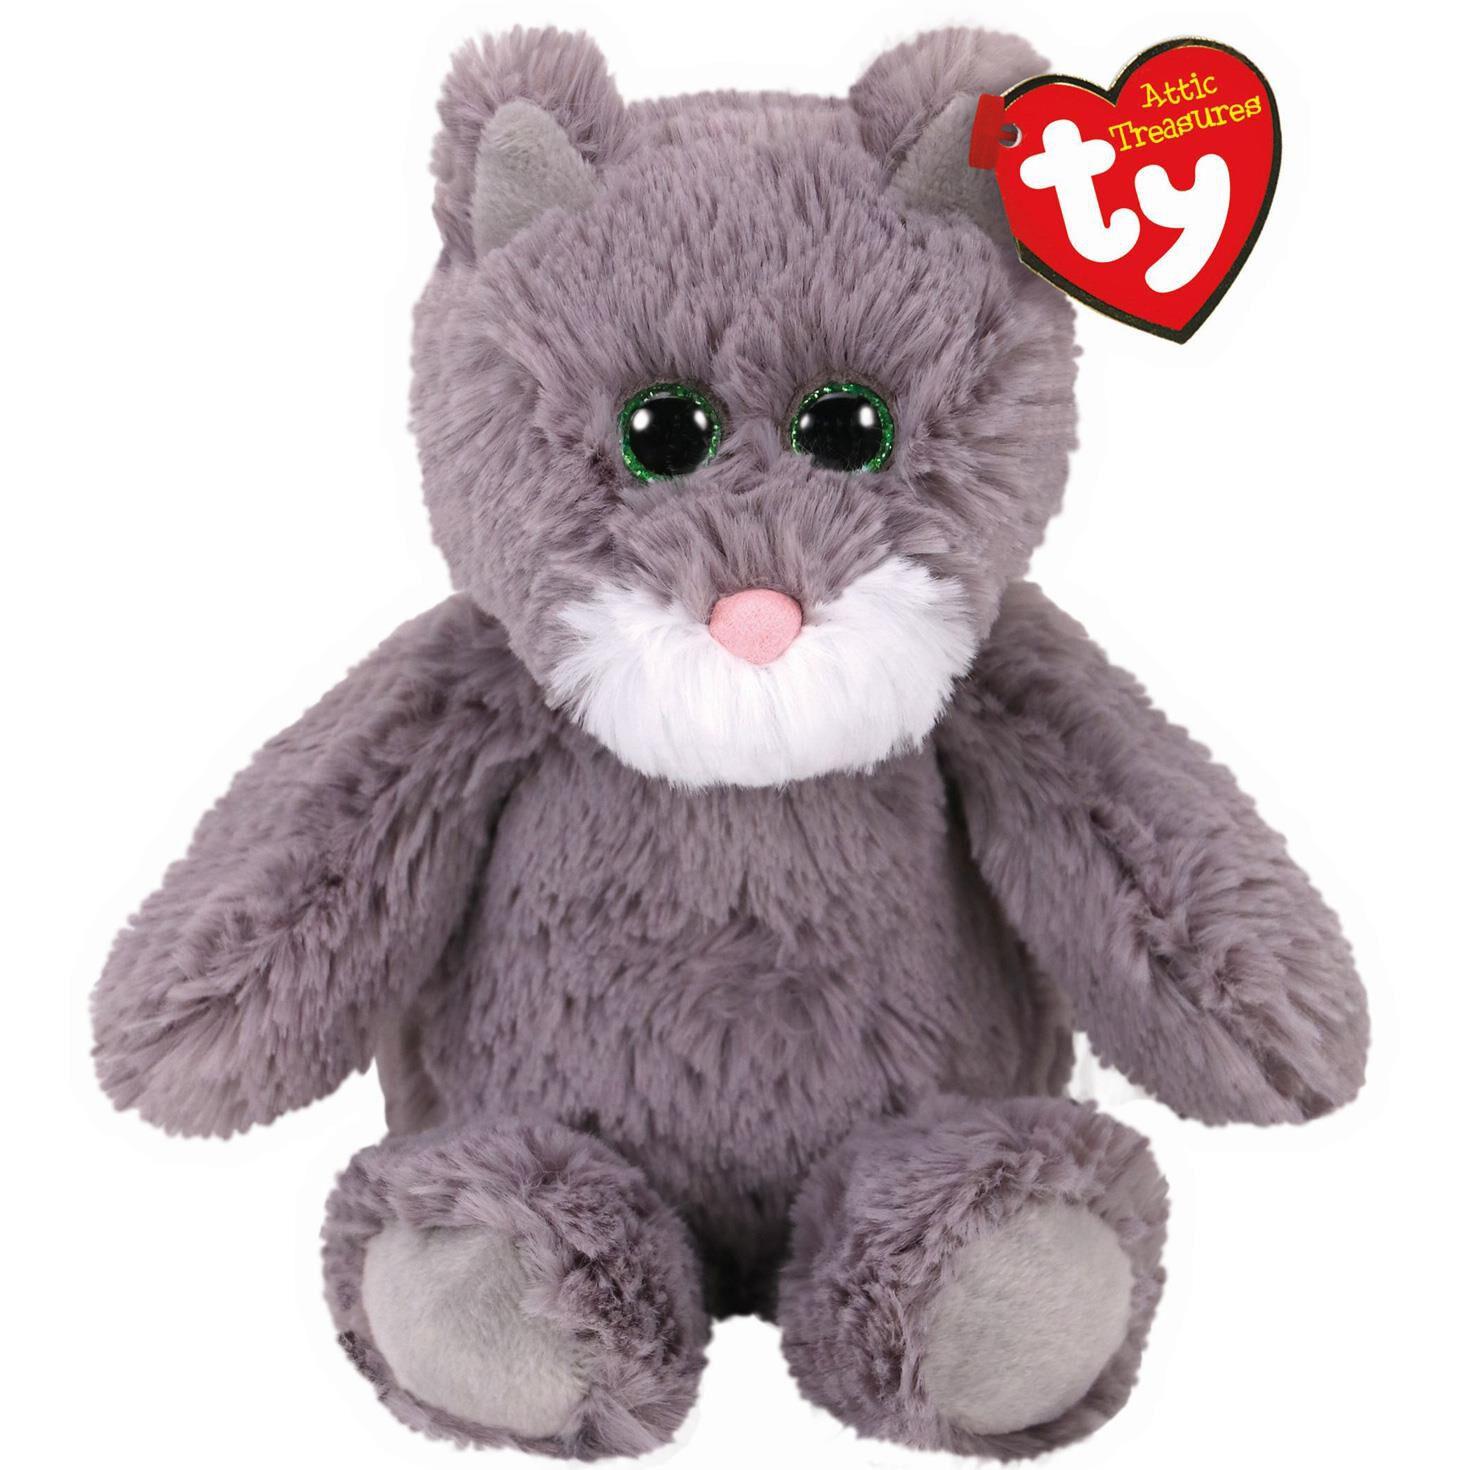 Ty® Attic Treasures Kit Cat Stuffed Animal 8  - Classic Stuffed Animals - Hallmark  sc 1 st  Hallmark & Ty® Attic Treasures Kit Cat Stuffed Animal 8